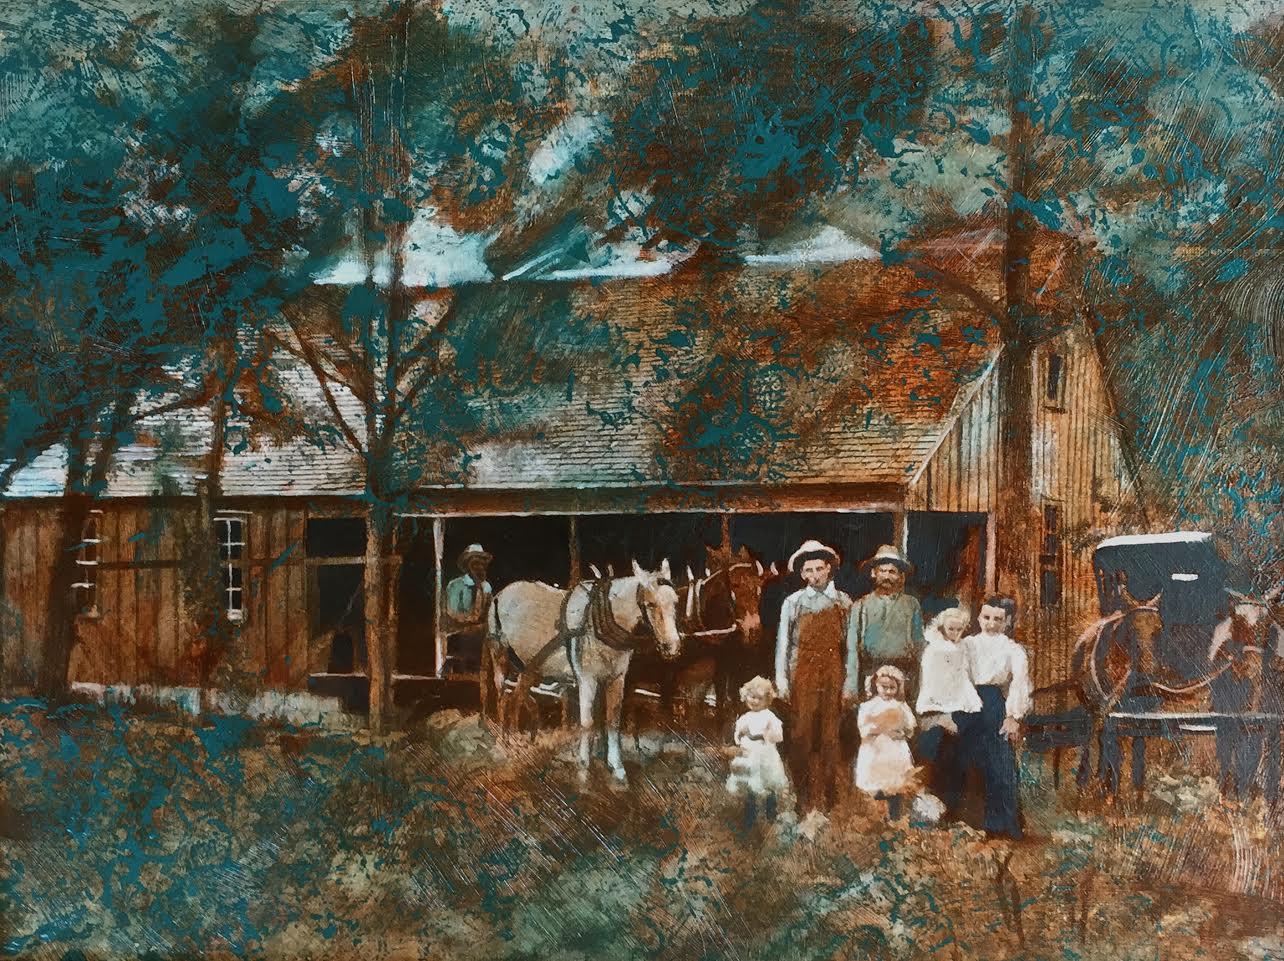 James Family Cabin